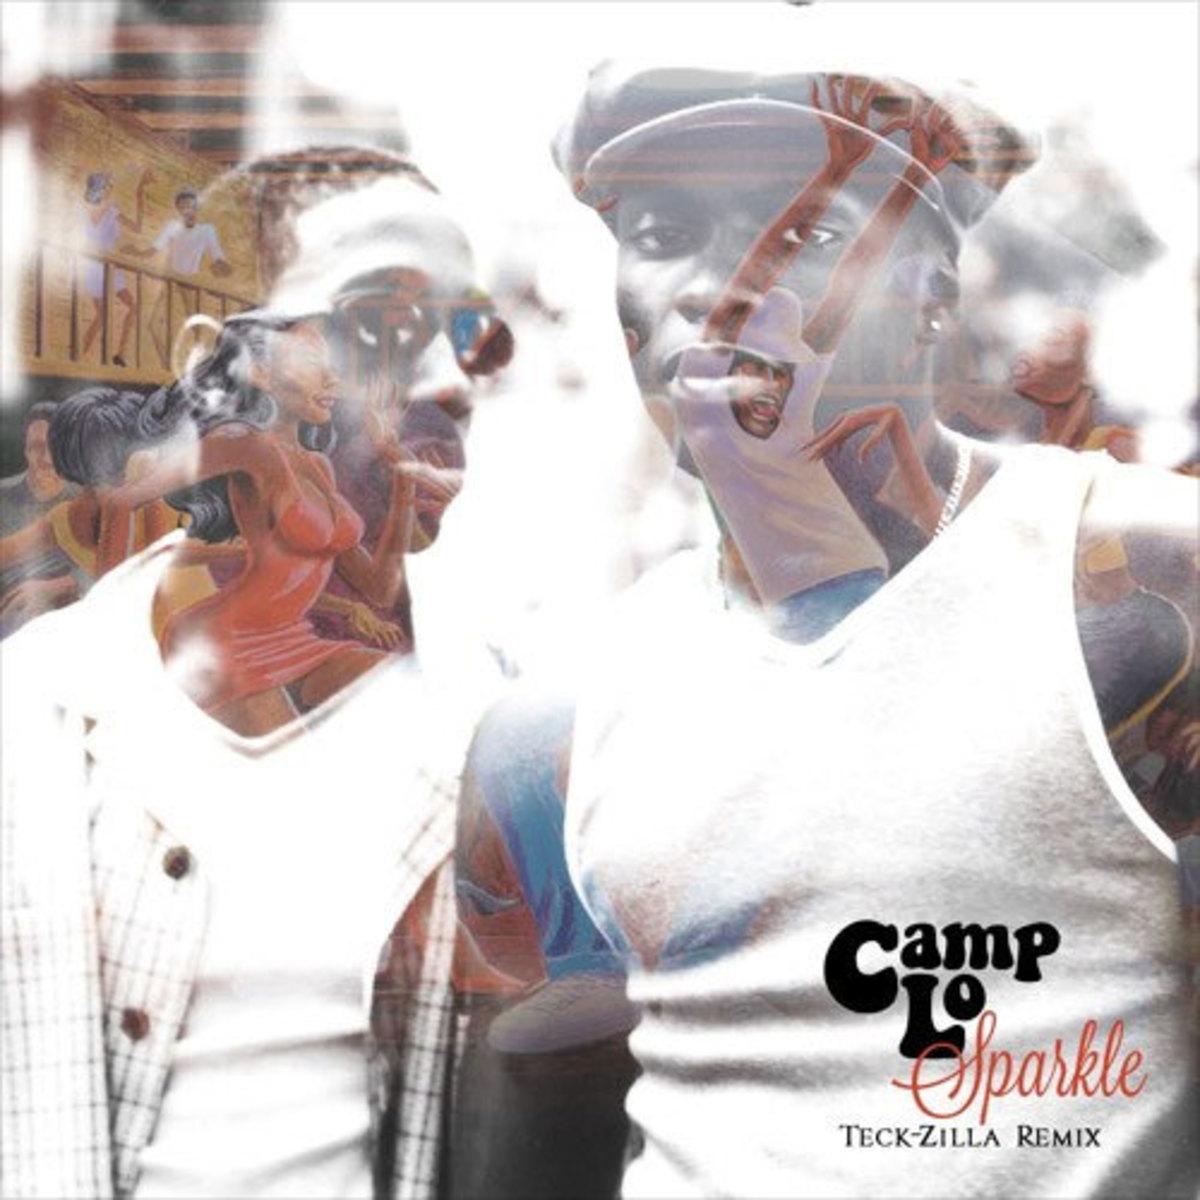 camp-lo-sparkle-teck-zilla-remix.jpg